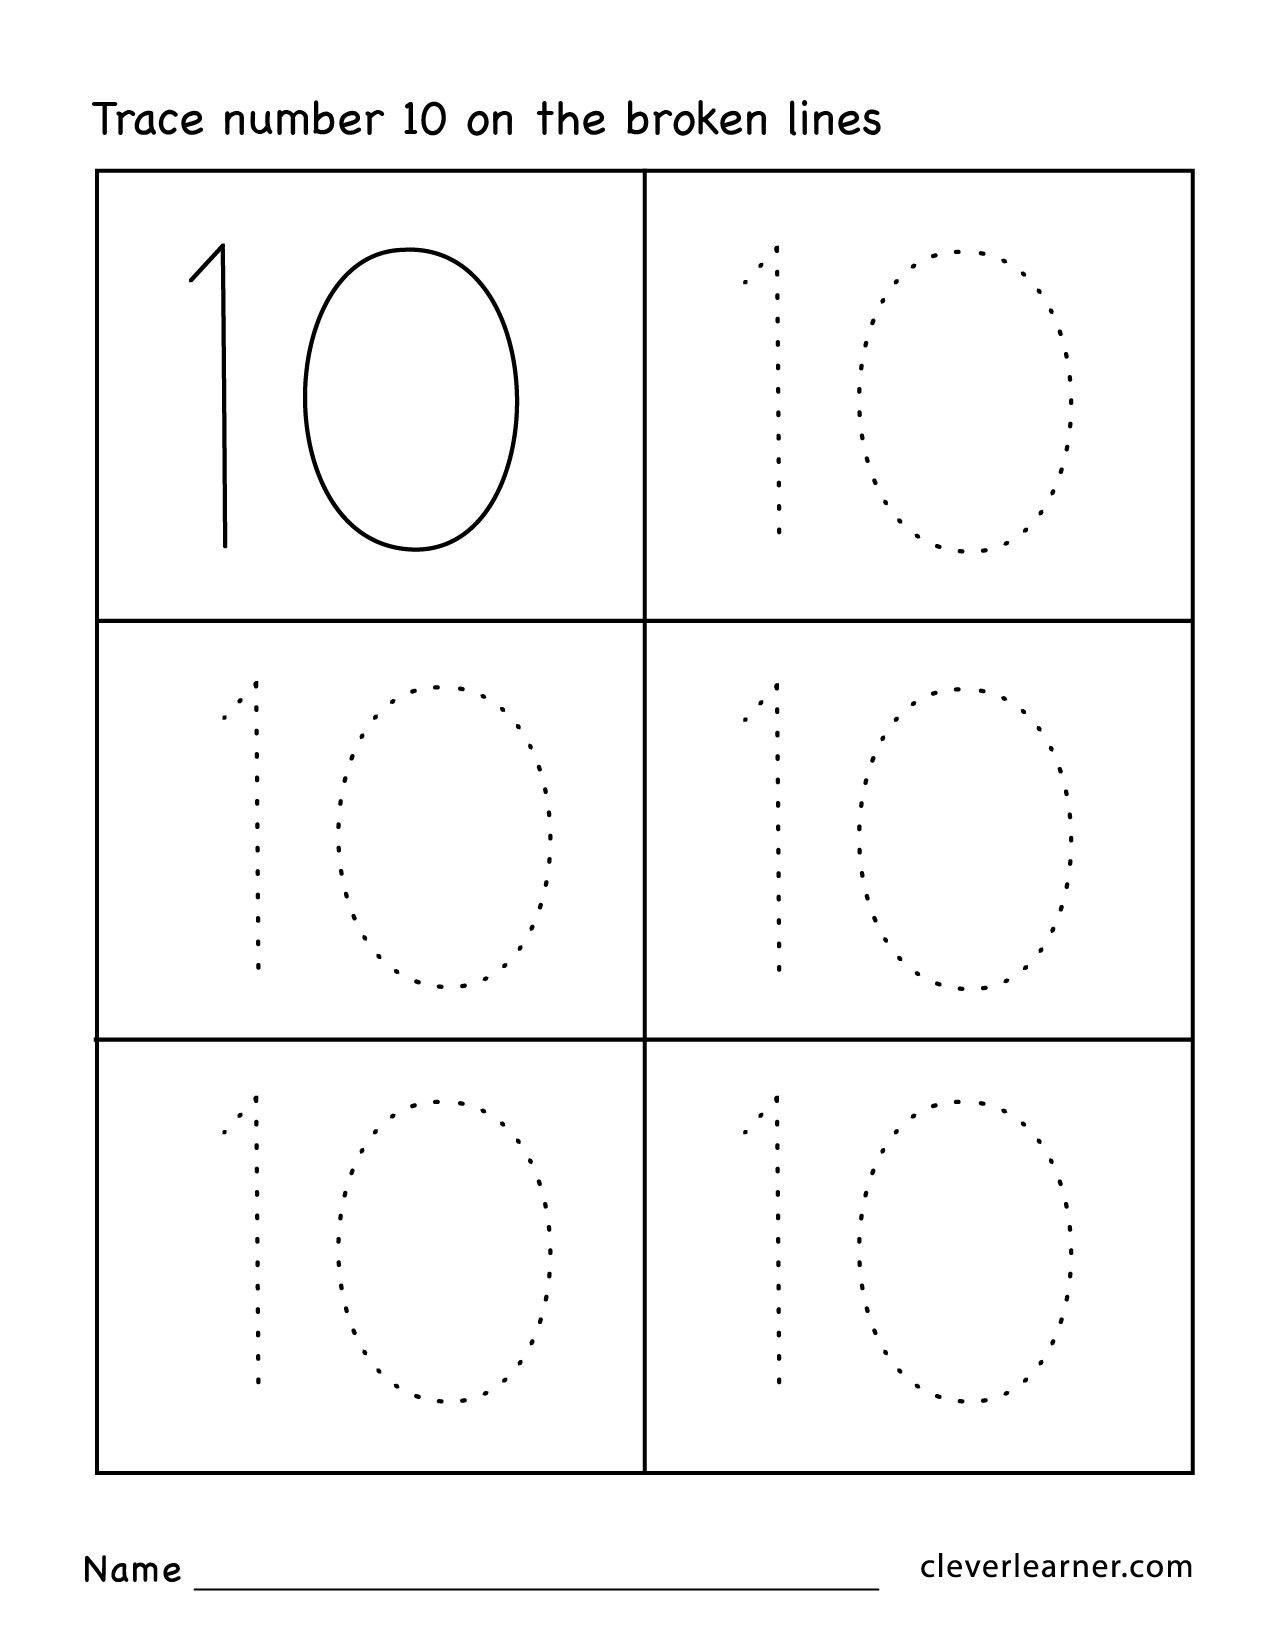 21 Number Tracing Worksheets Simbologia